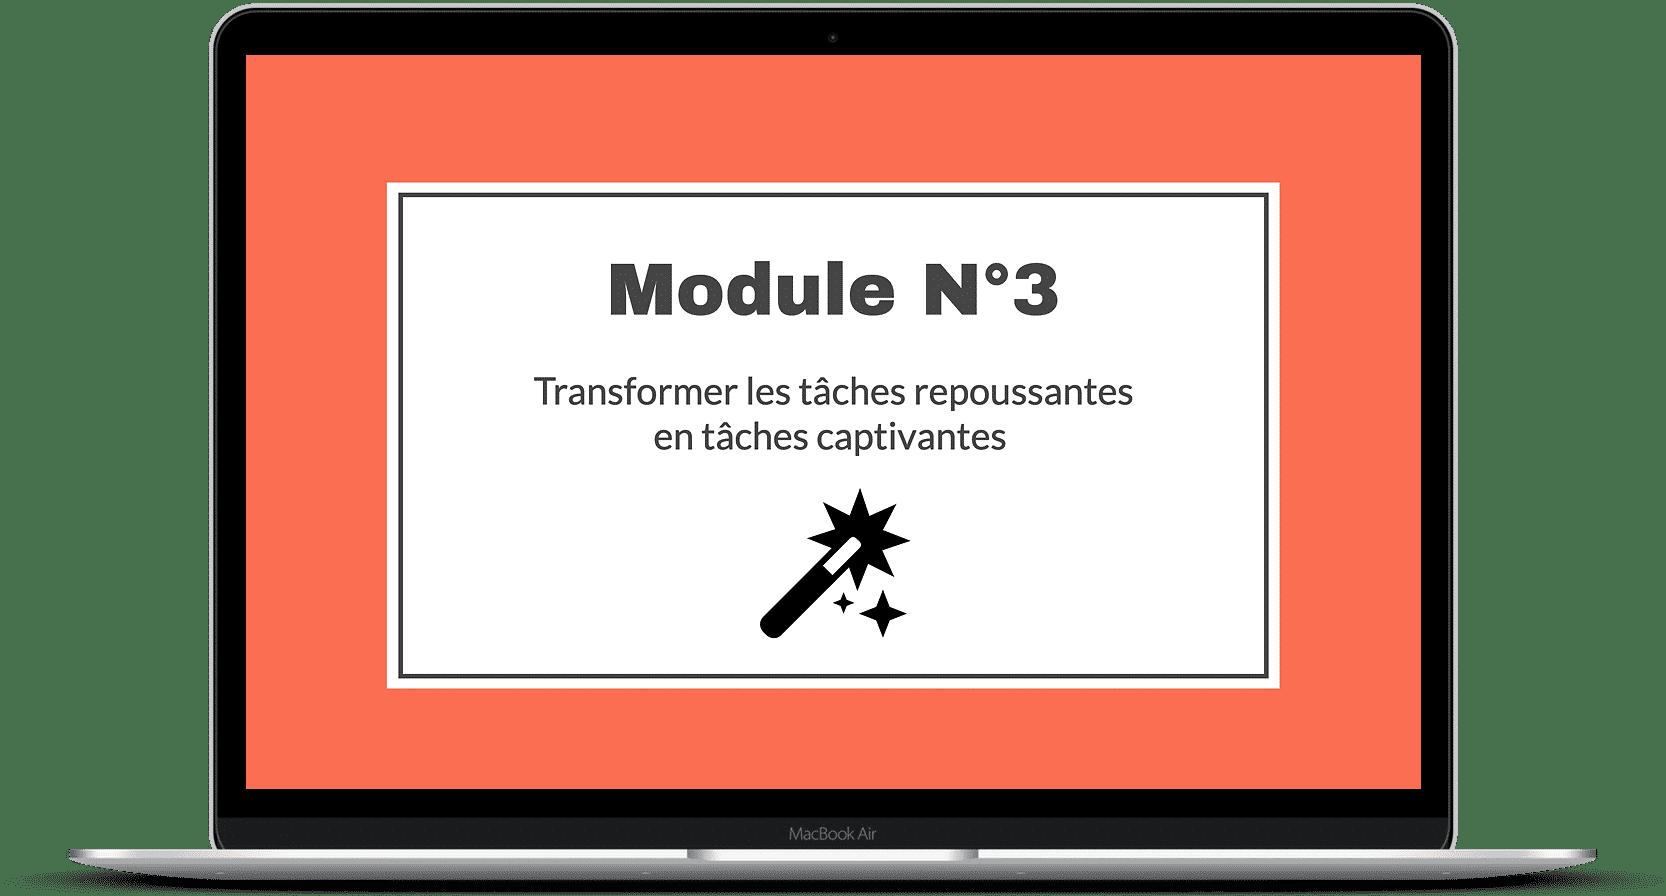 procrastination bénéfique module 3